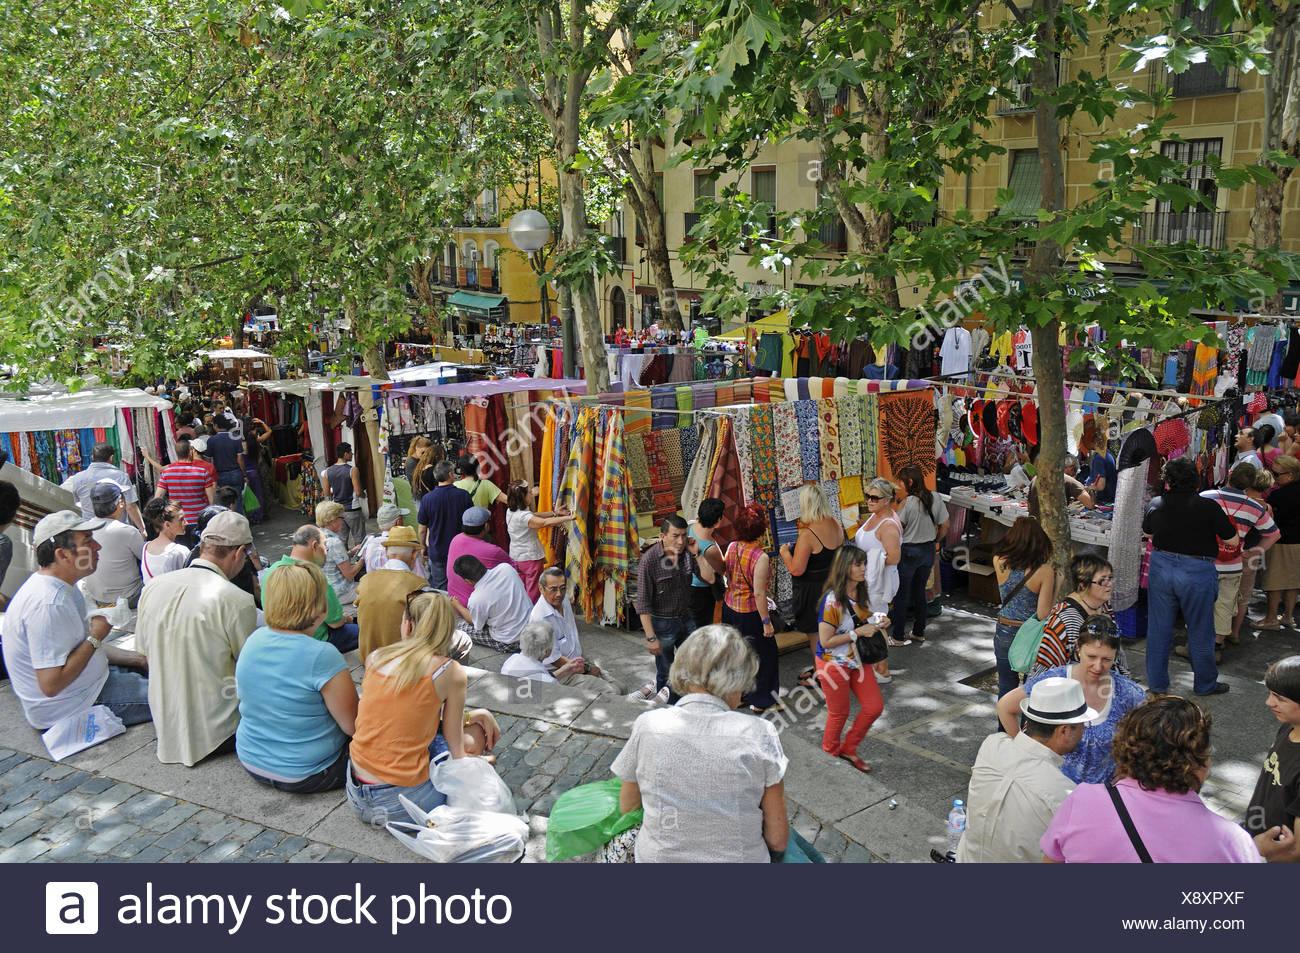 El Rastro, flea market, Madrid, Spain - Stock Image